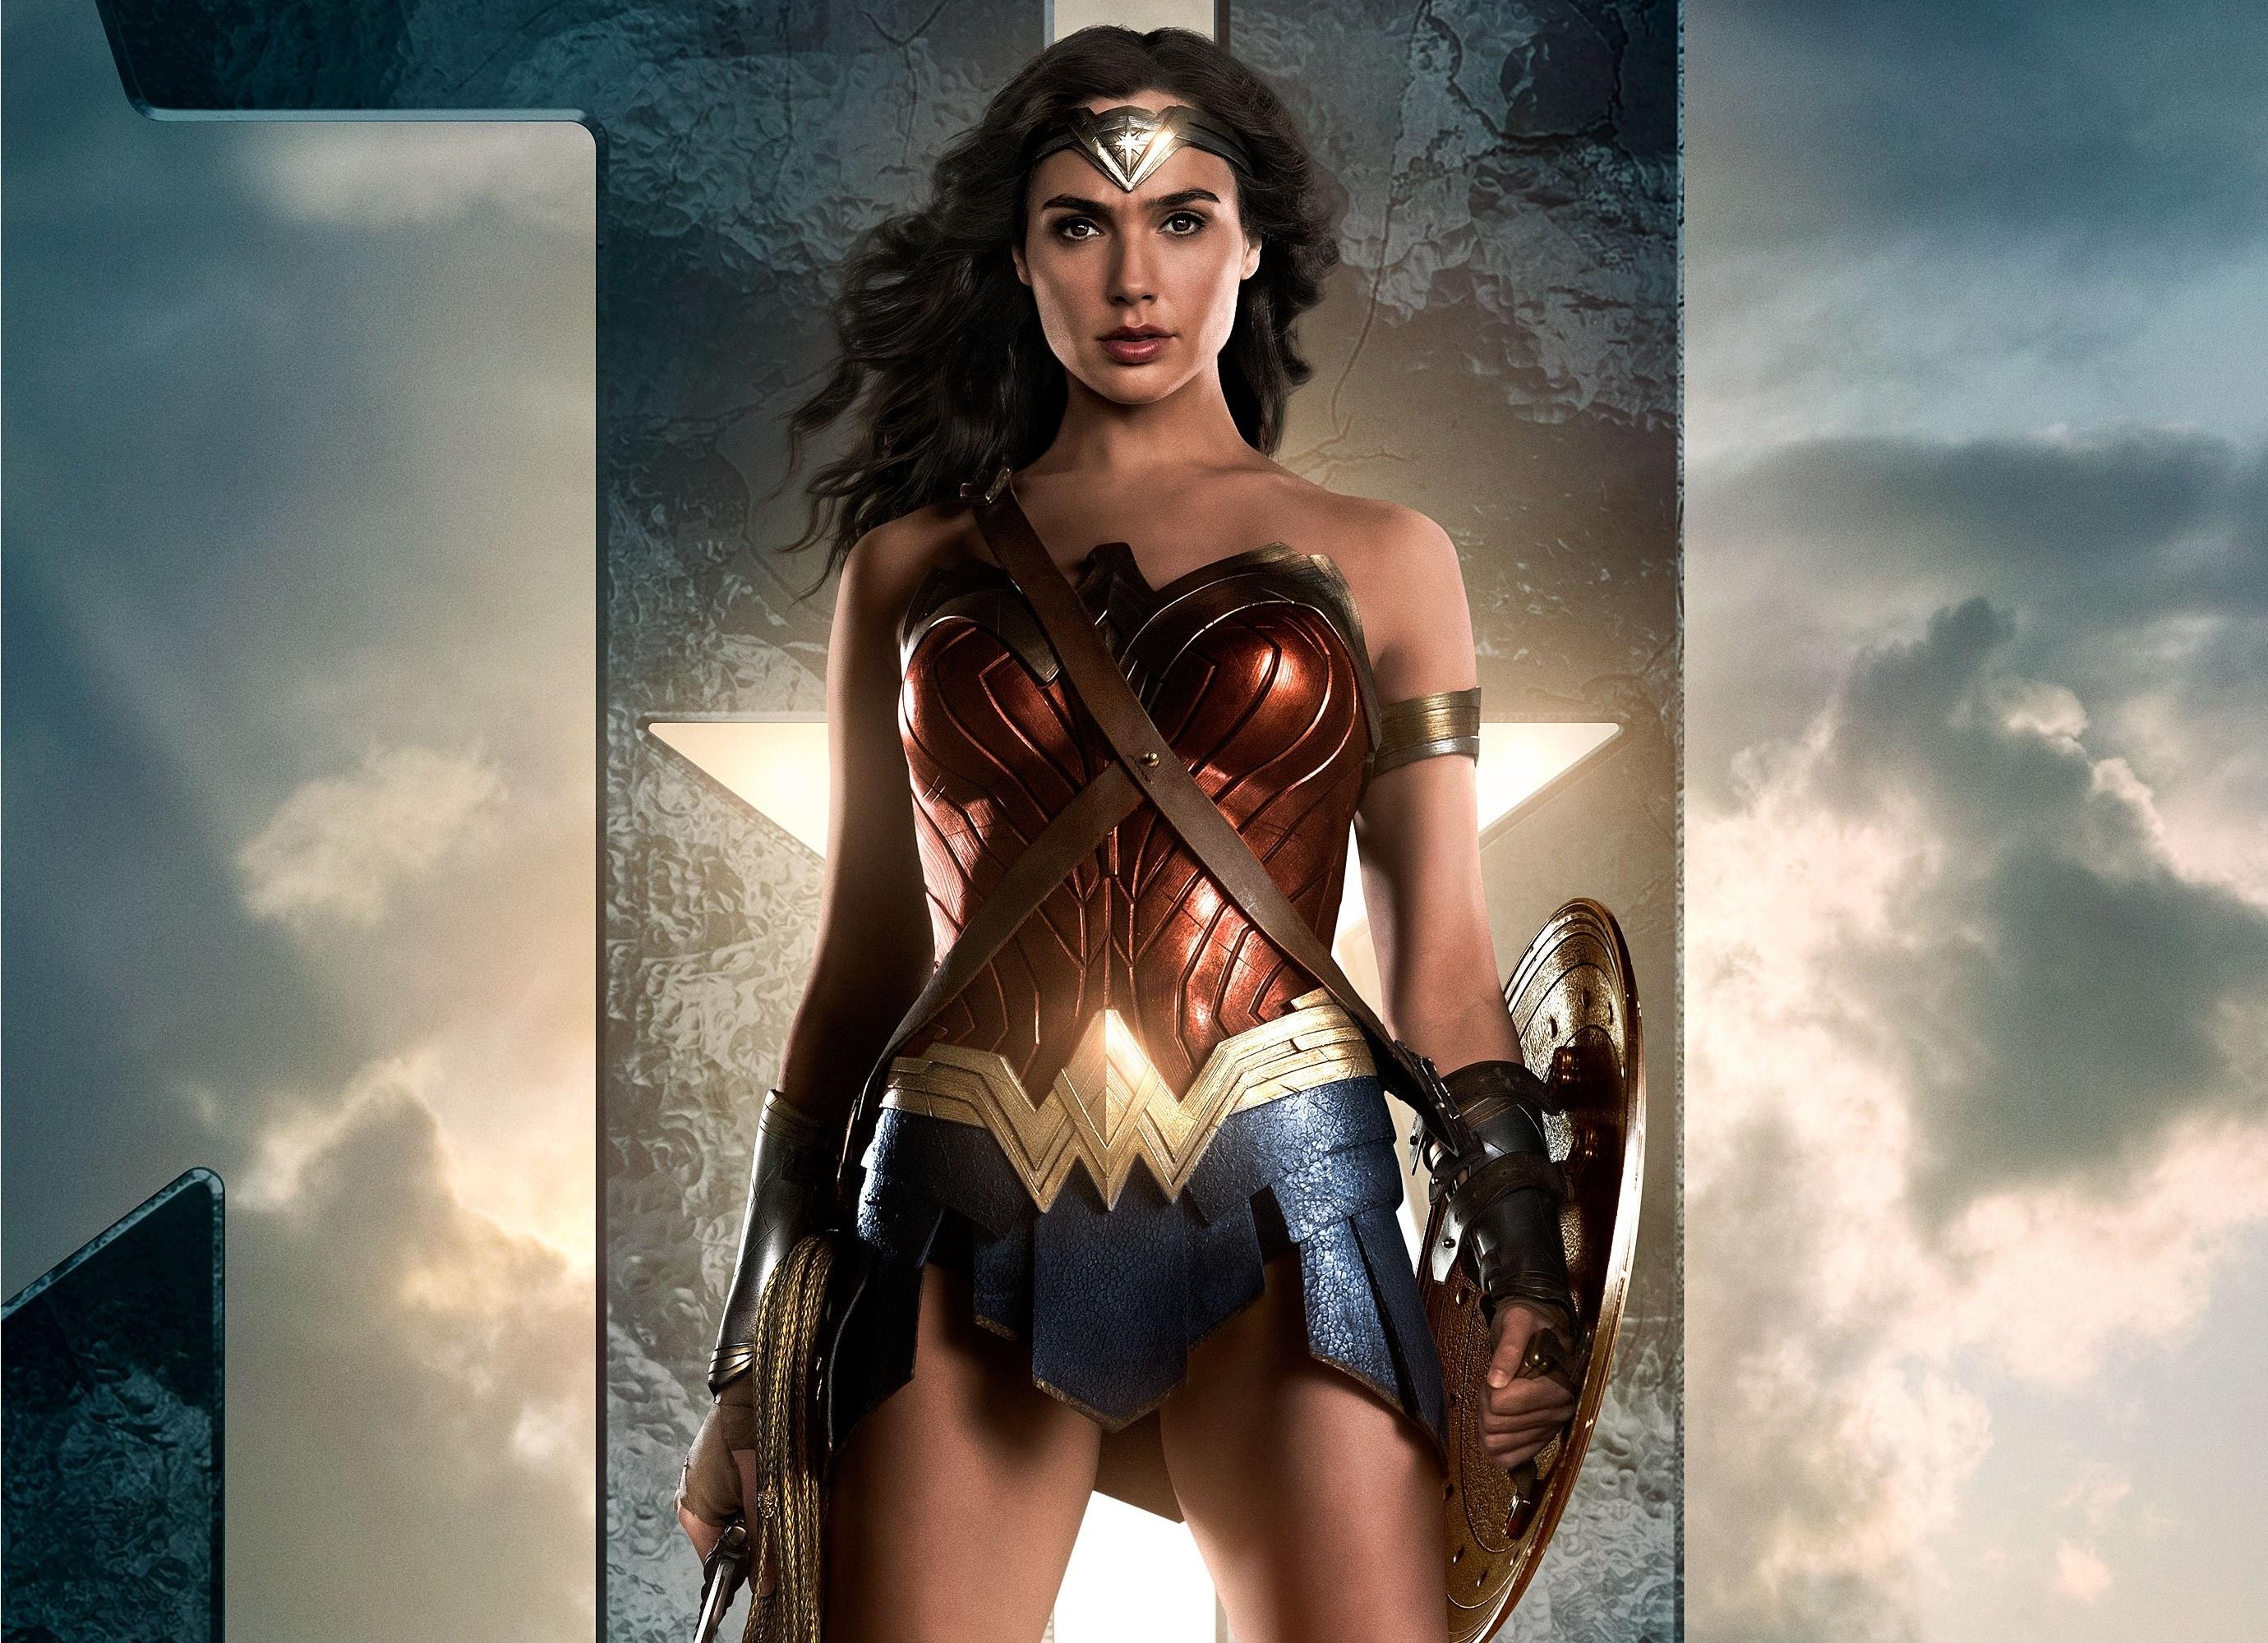 Wallpaper Gal Gadot Wonder Woman 2017 Movies Hd Movies: Justice League (2017) HD Wallpaper